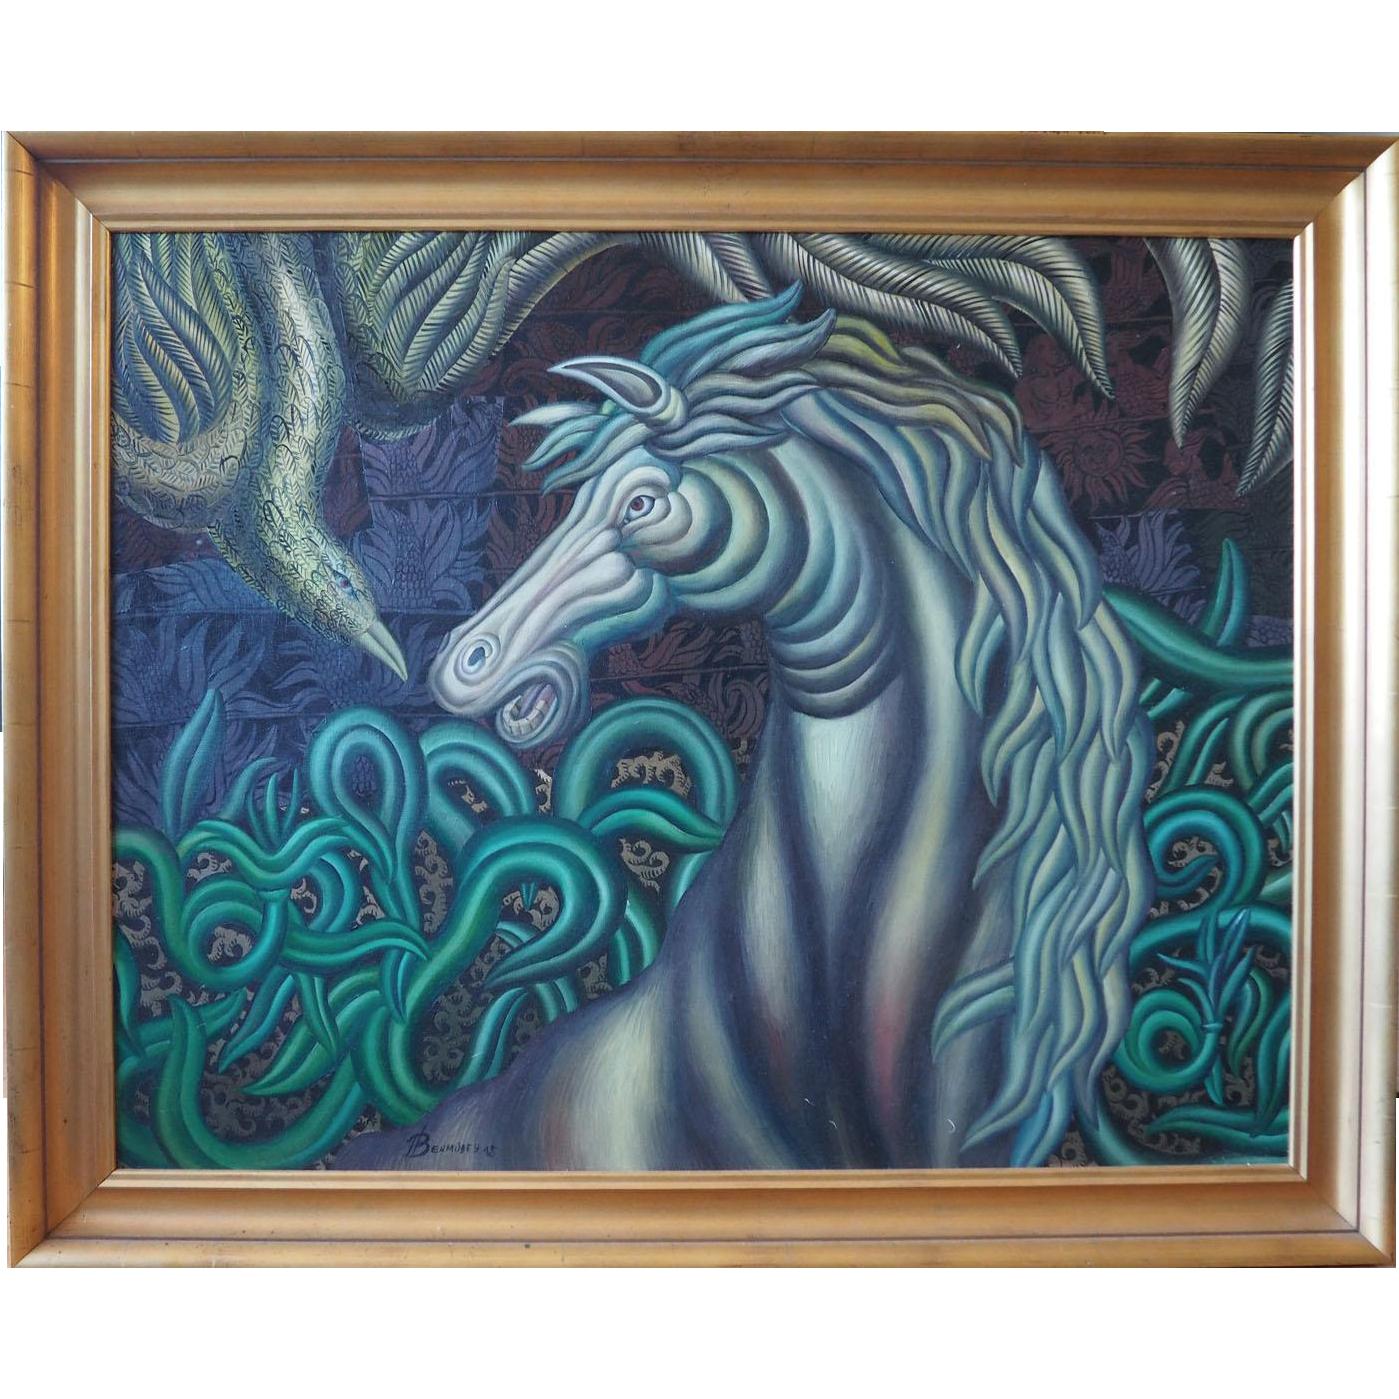 Horse and bird original surreal mythical painting by Henry Bermudez Venezuela